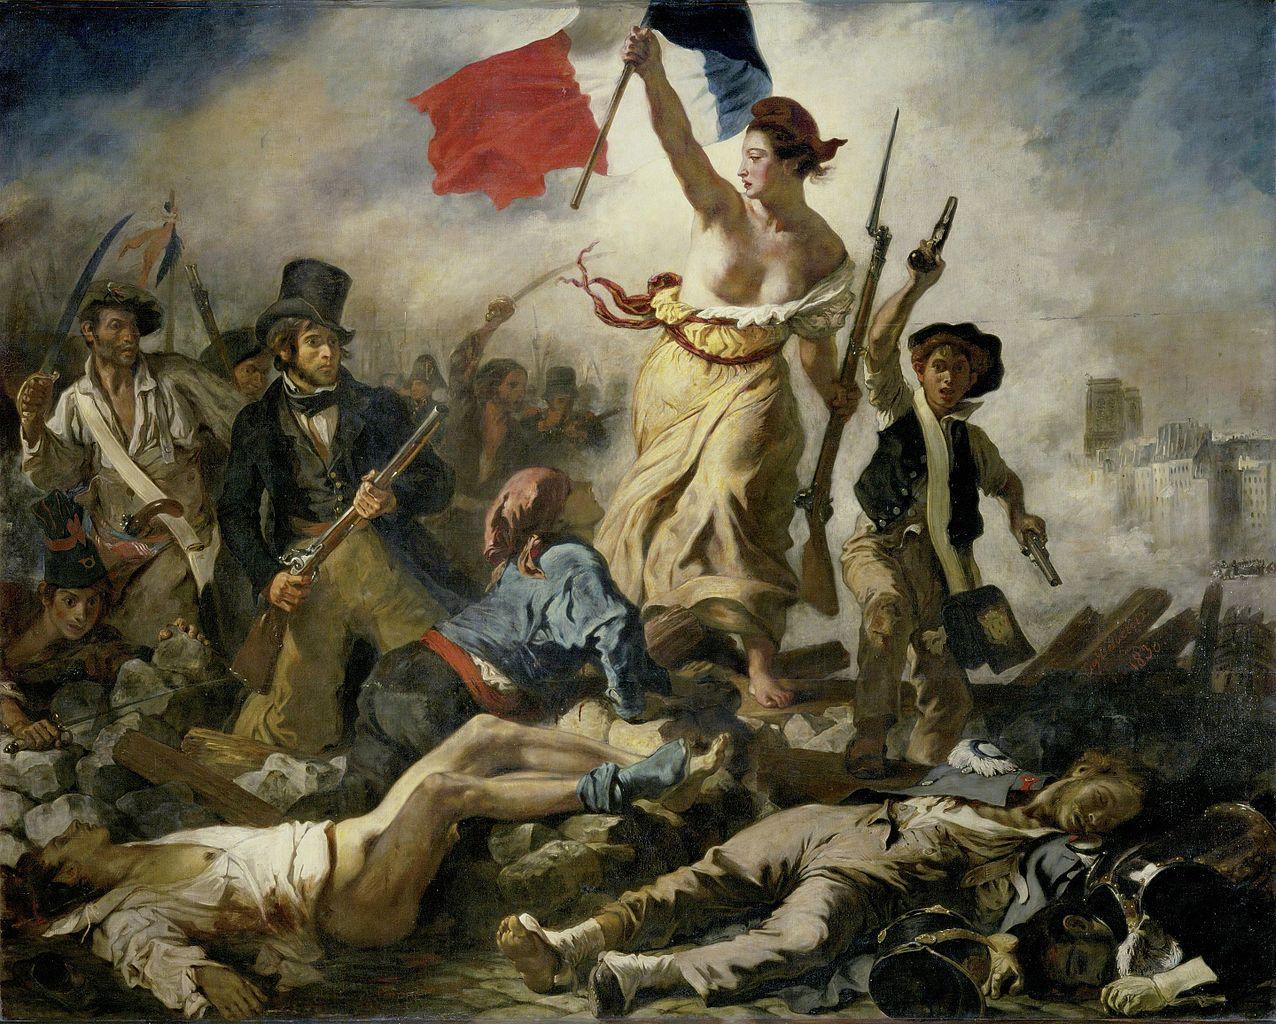 Liberty Leading the People, 1830, Delacroix Eugène, France